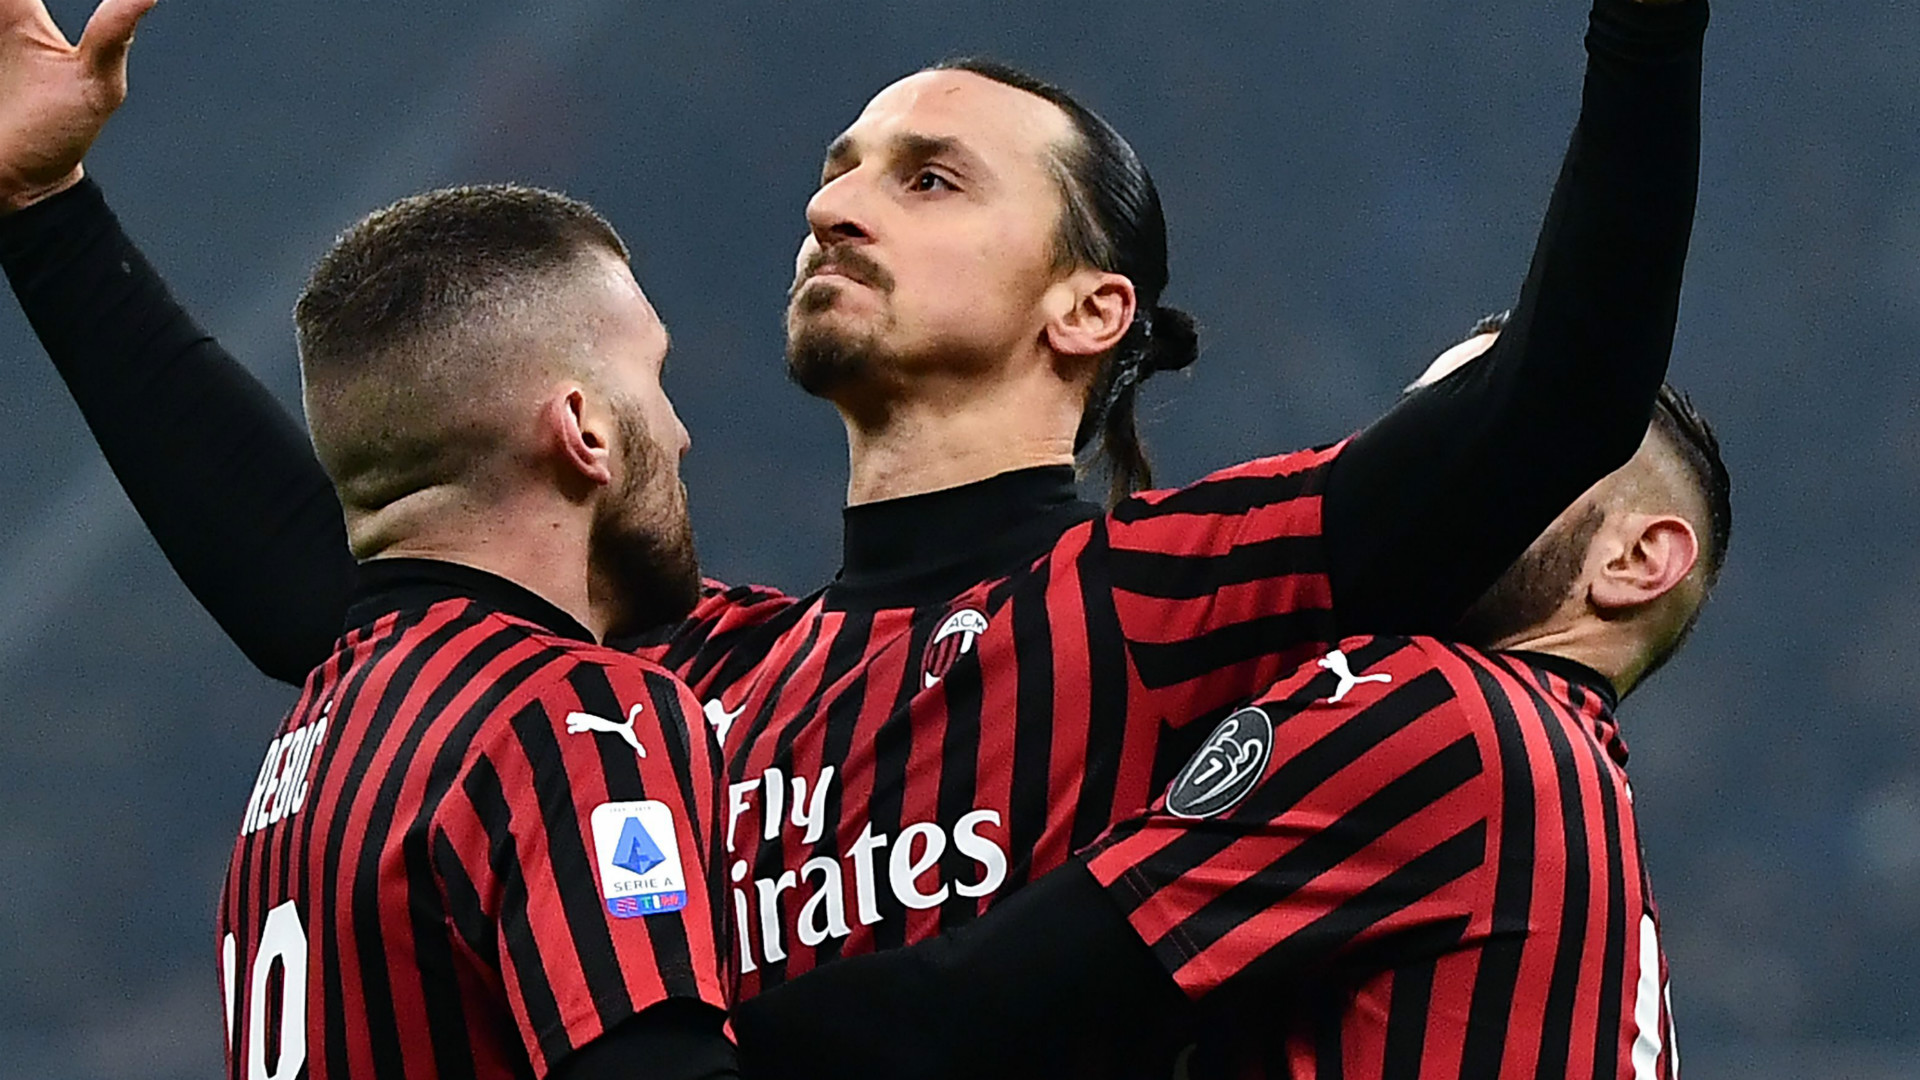 AC Milan star Ibrahimovic has no ego - Calhanoglu